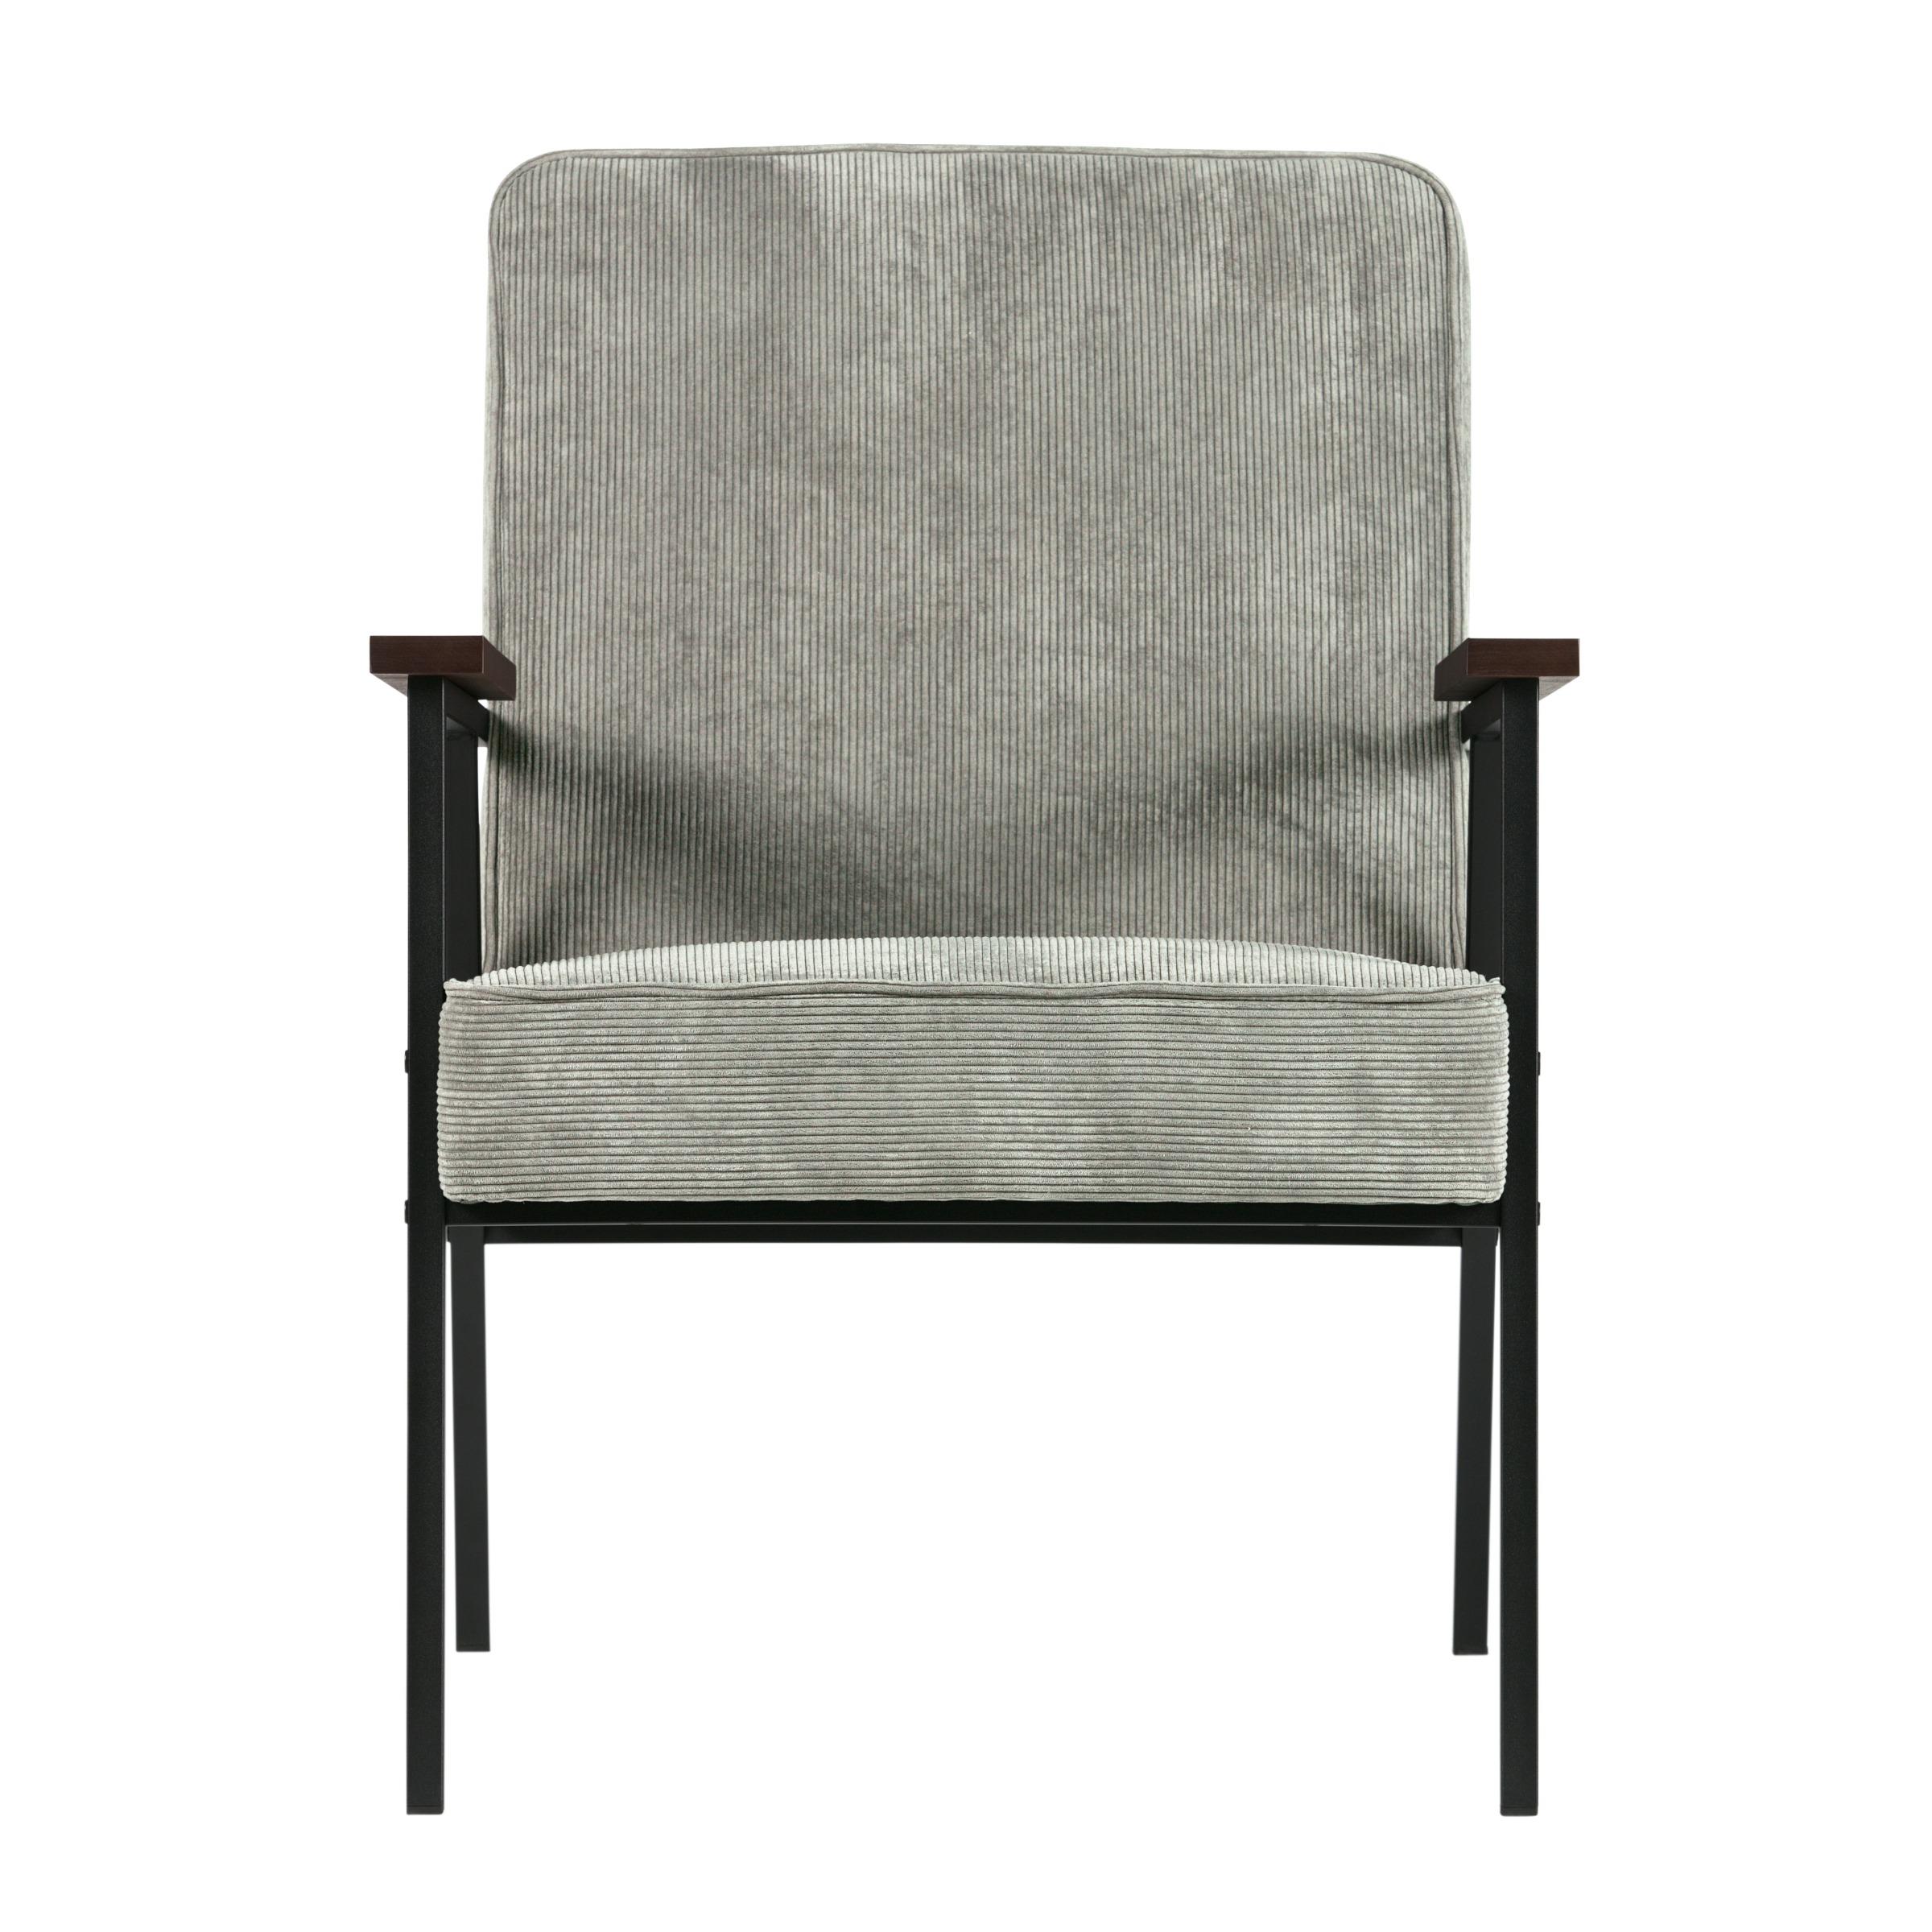 WOOOD fauteuil Sally ribcord vergrijsd groen